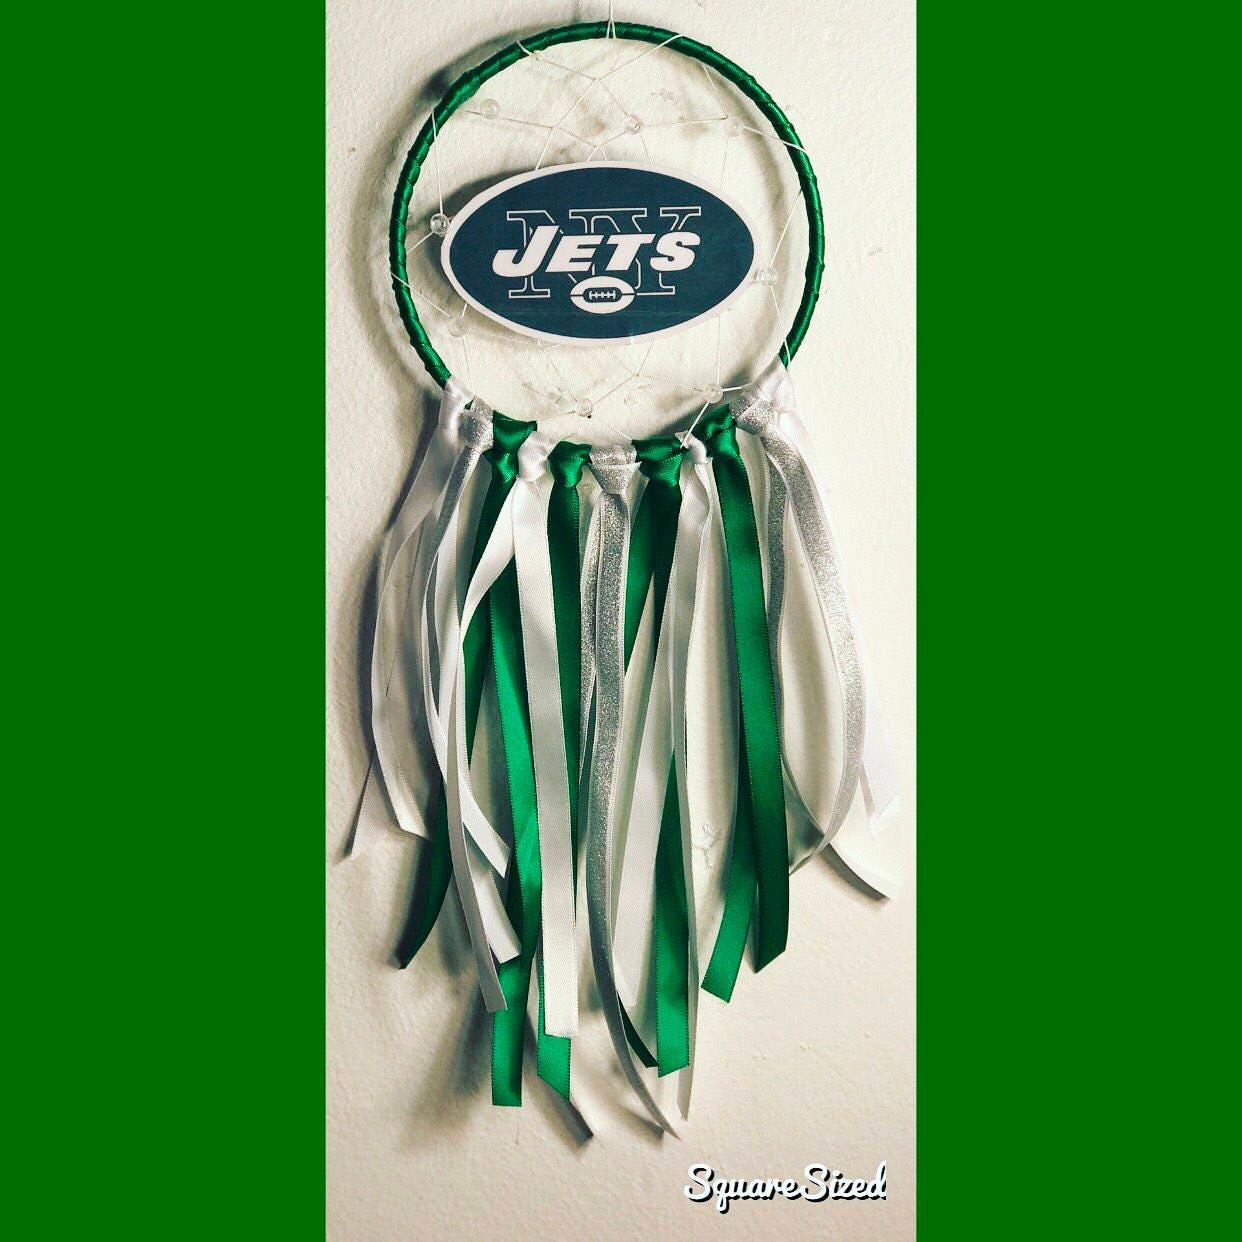 Small NY Jets Dream Catcher New York Jets Decor Jets Gift